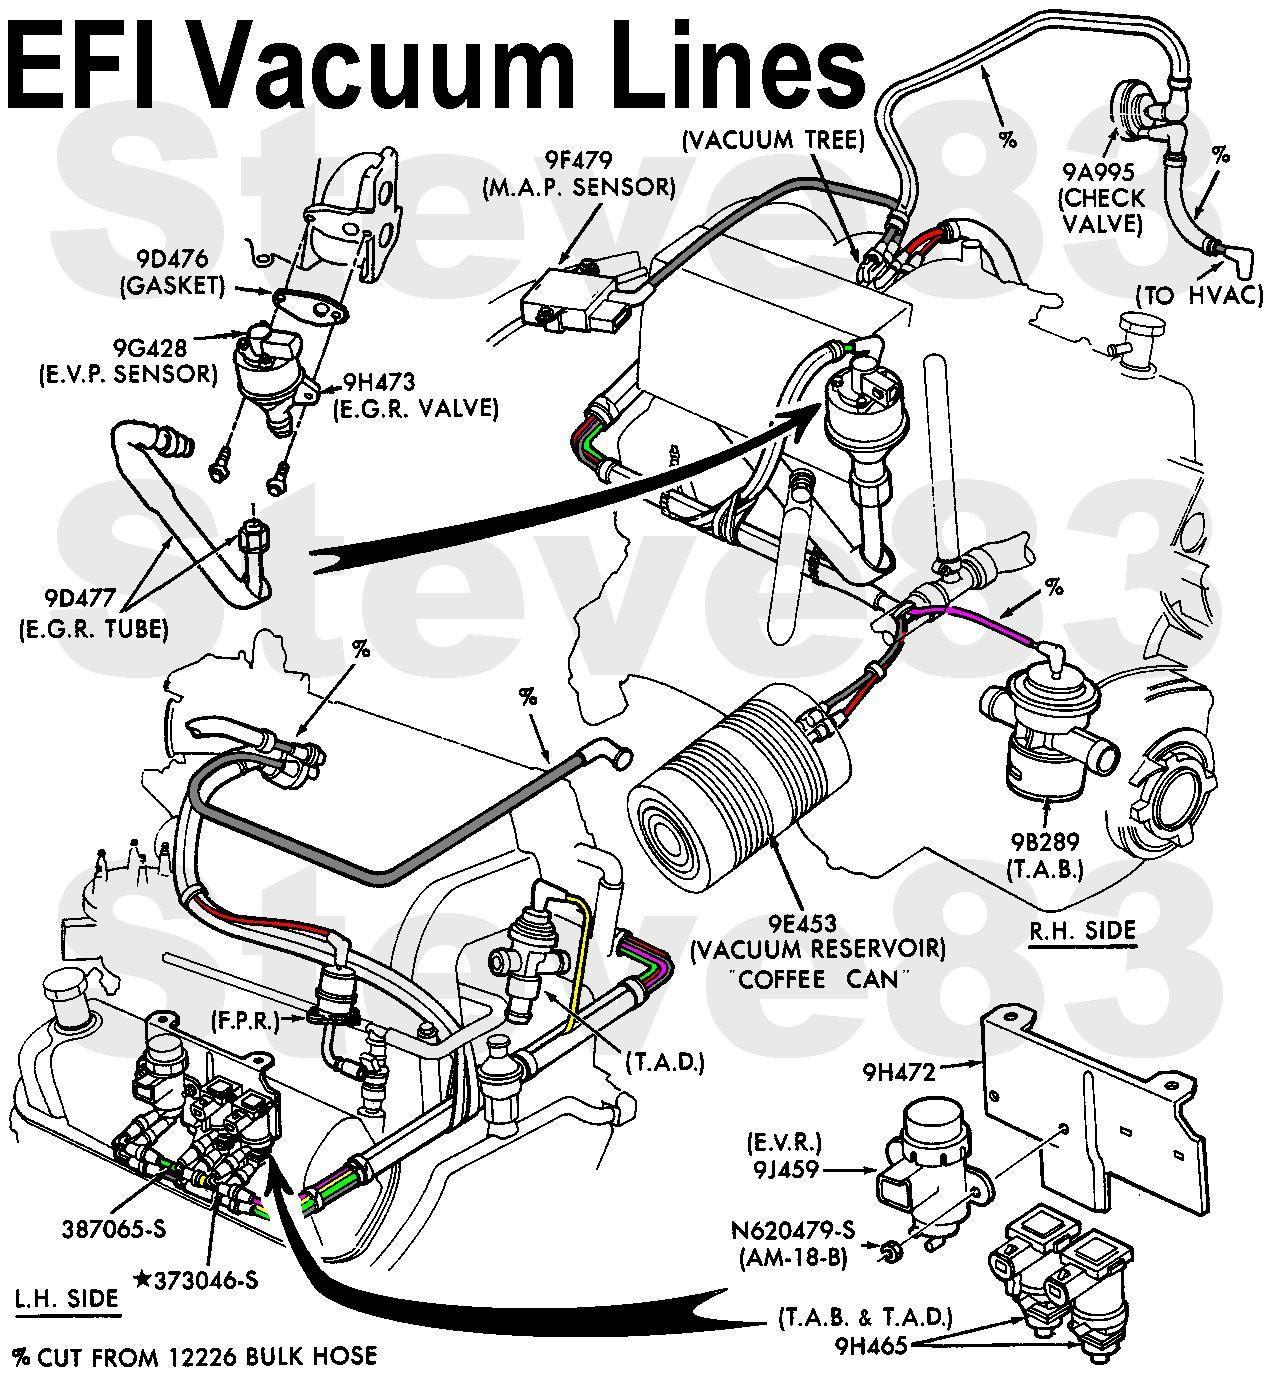 f150 engine diagram honda goldwing wiring ford 1989 04 lariat 4x2 stock